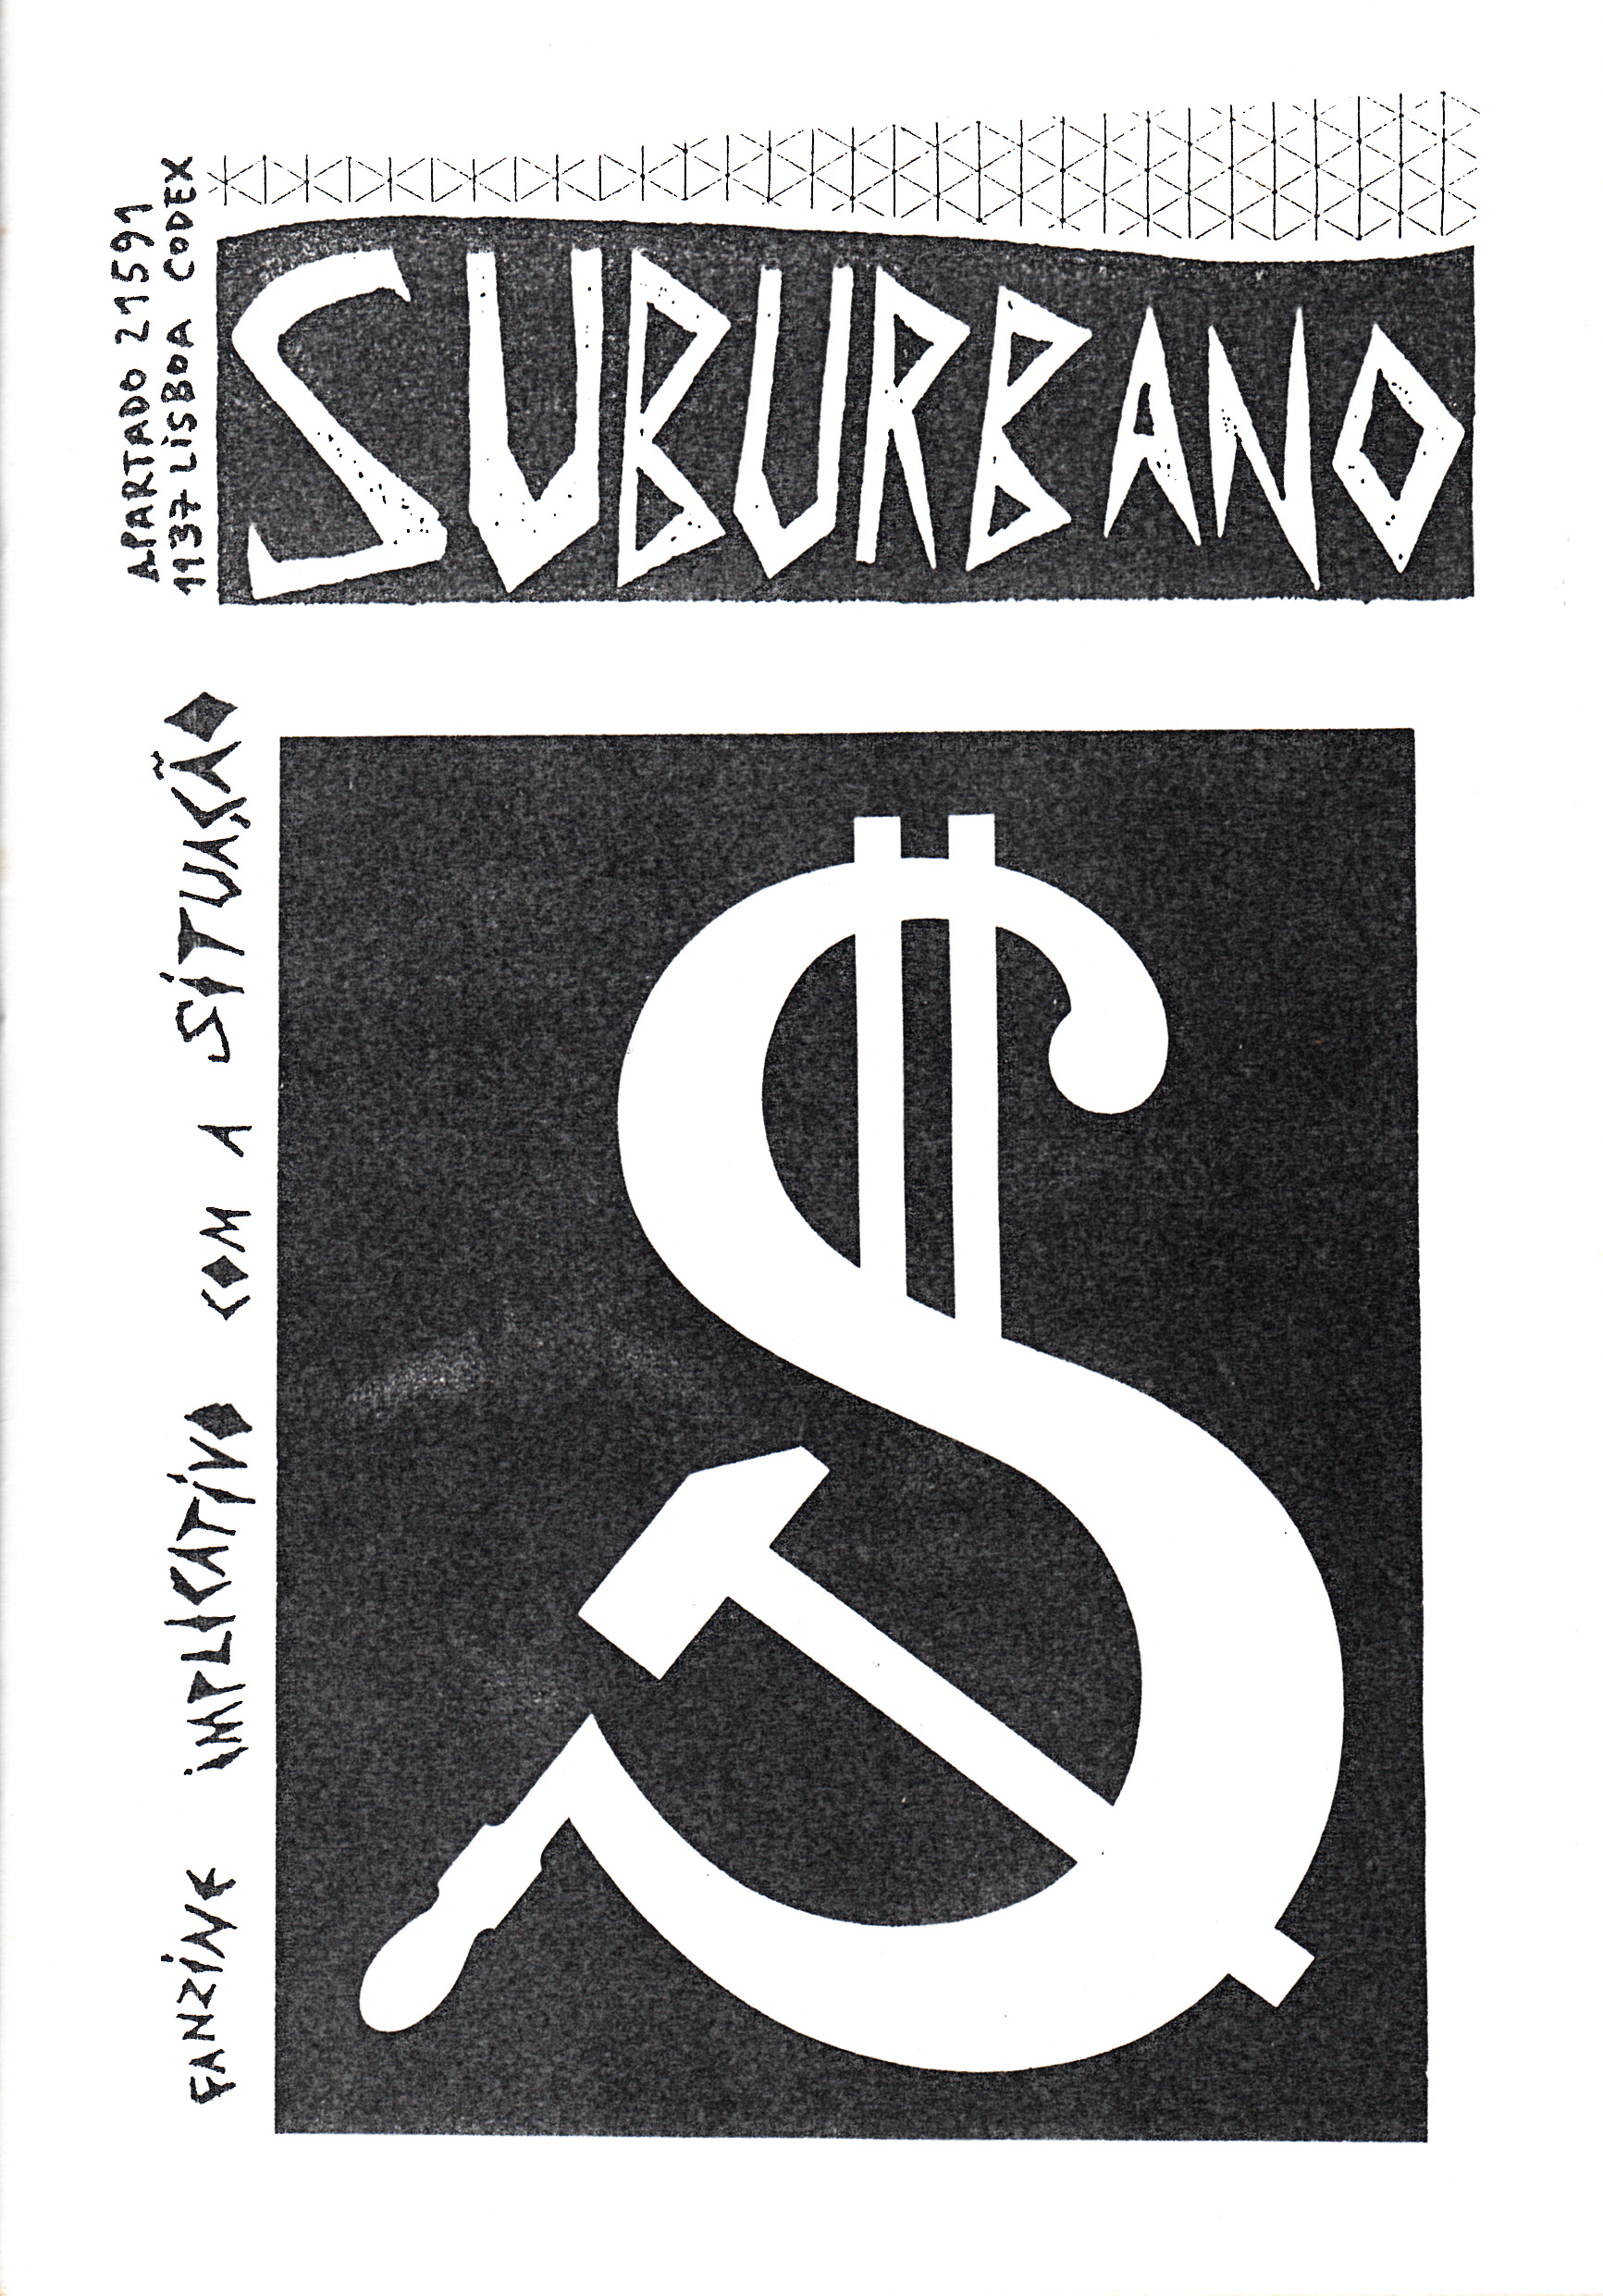 Suburbano_0004